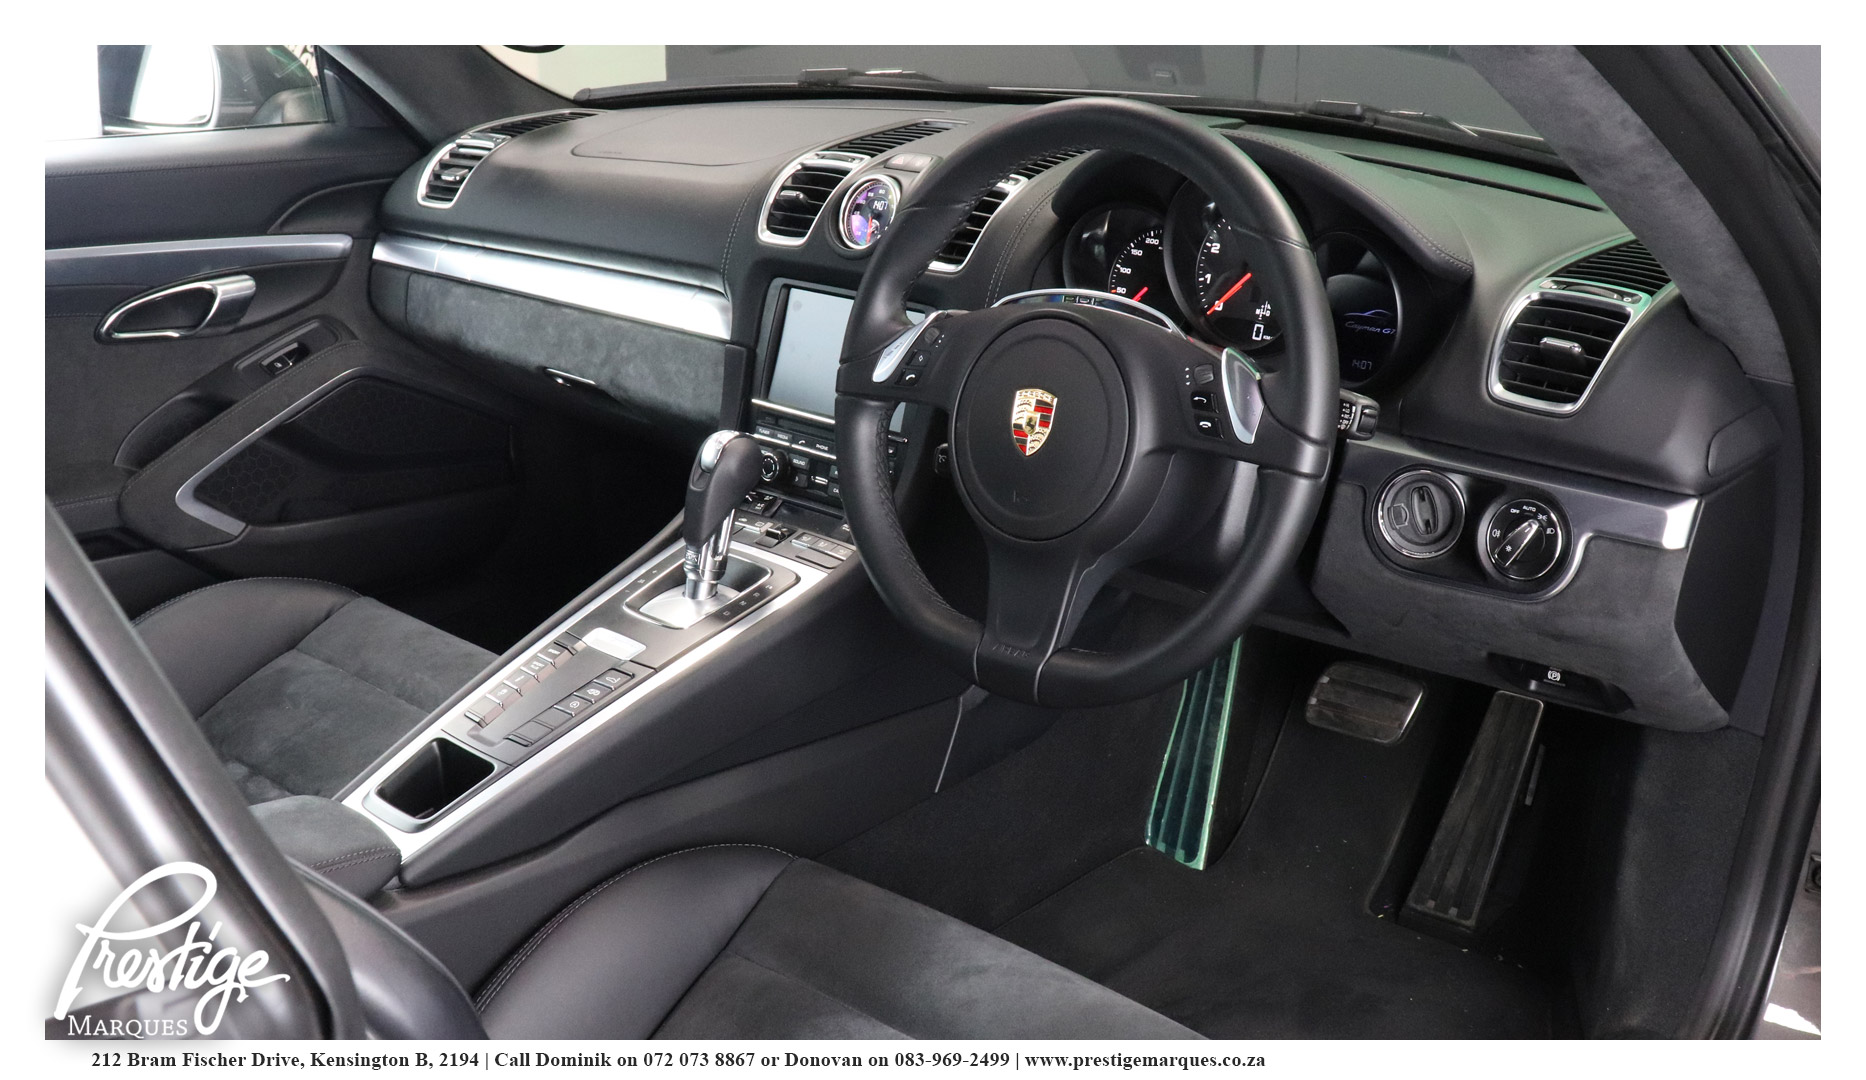 2015-Porsche-Cayman-GTS PDK-Prestige-Marques-Randburg-Sandton-13